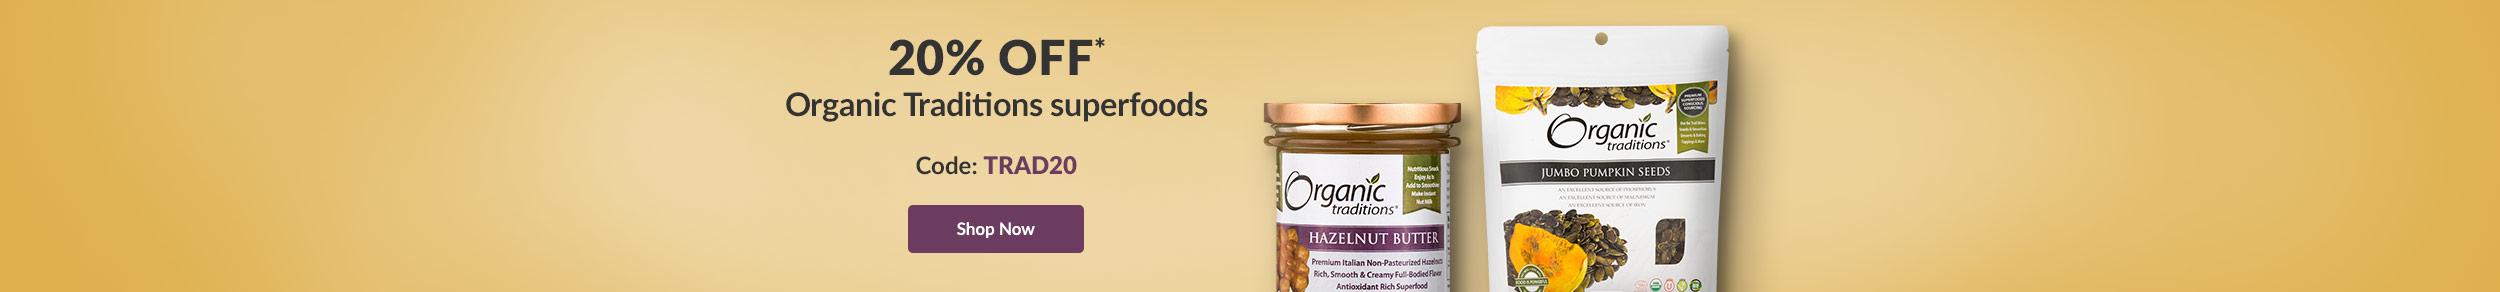 https://i3.pureformulas.net/images/static/Organic_Traditions_Food_Store_102819.jpg